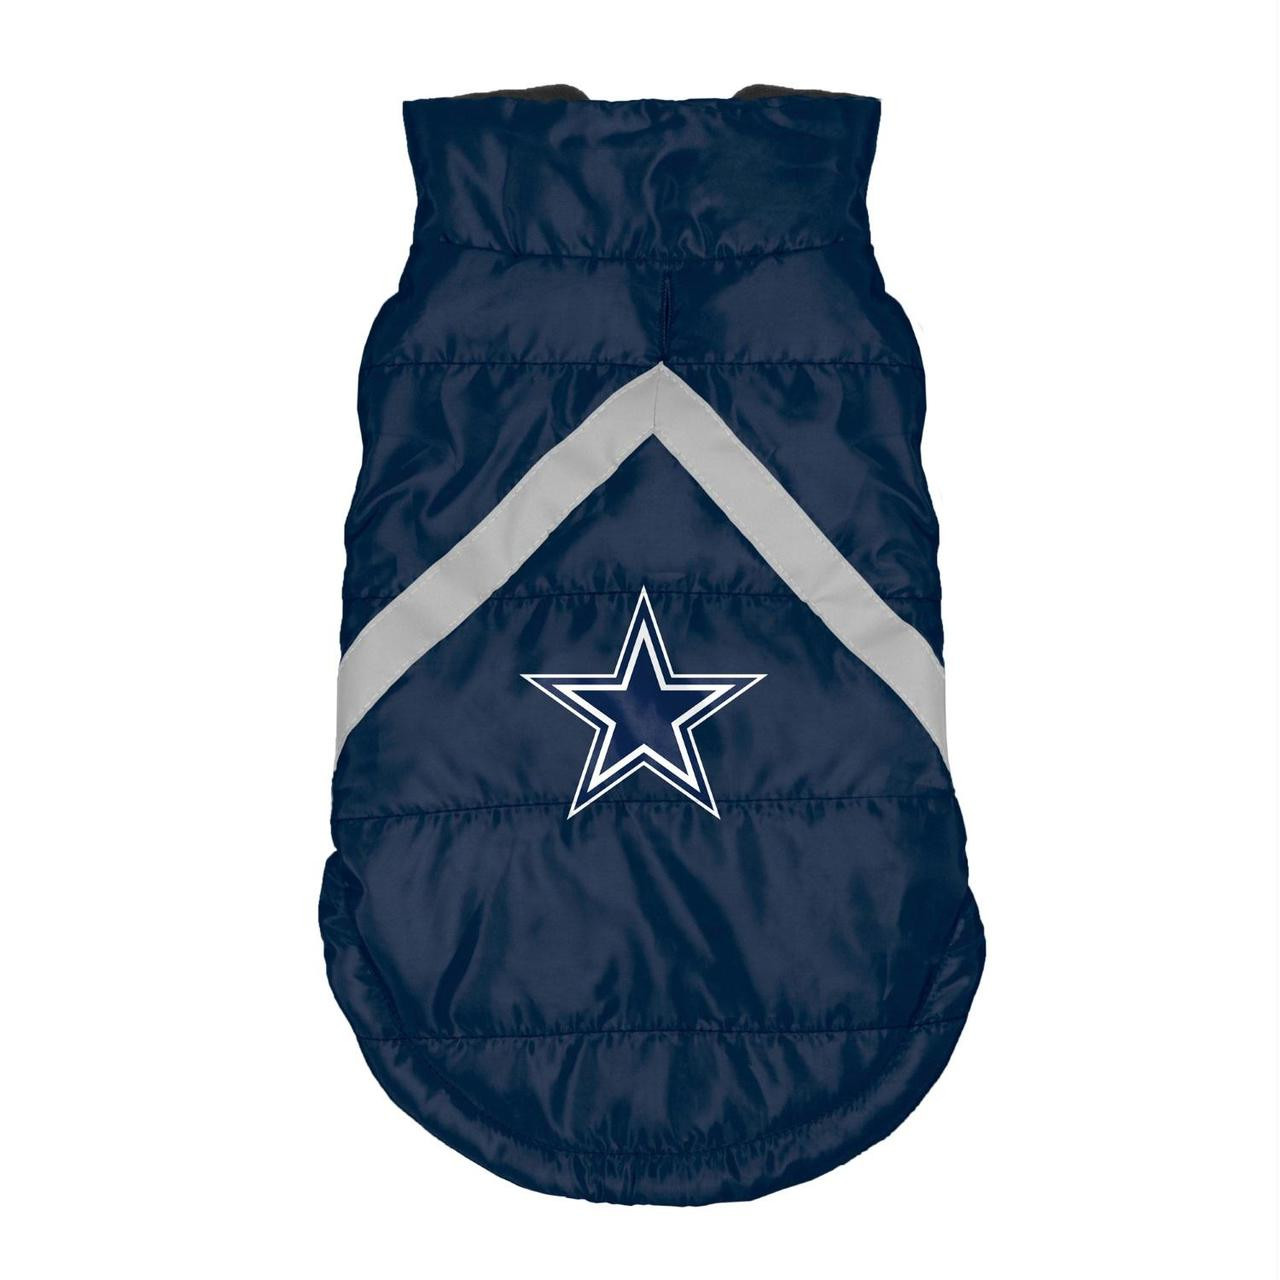 buy online 4f0a5 20eca Dallas Cowboys Pet Puffer Vest - Teacup